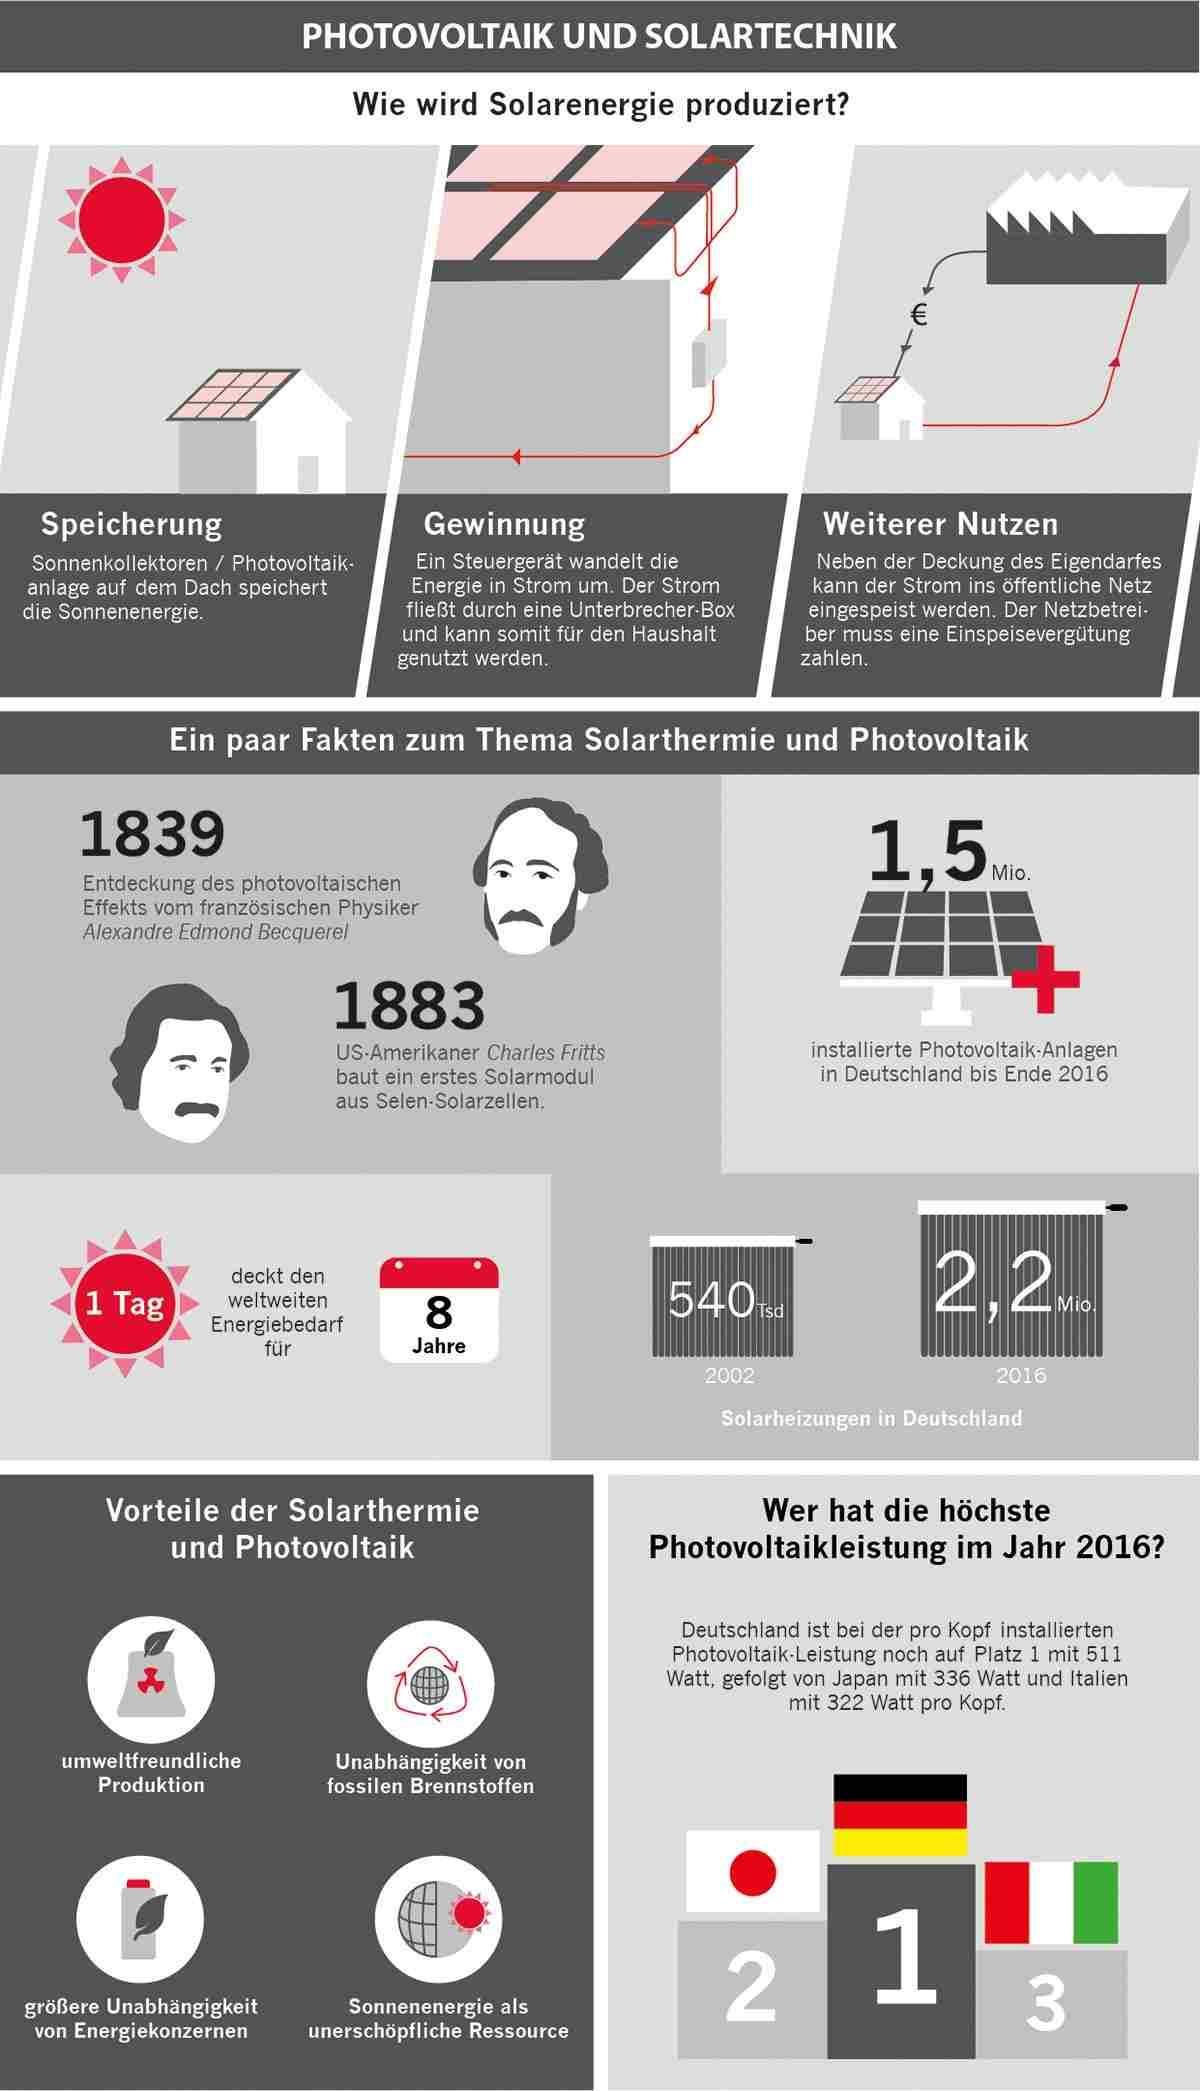 Infografik zum Thema Photovoltaik und Solartechnik